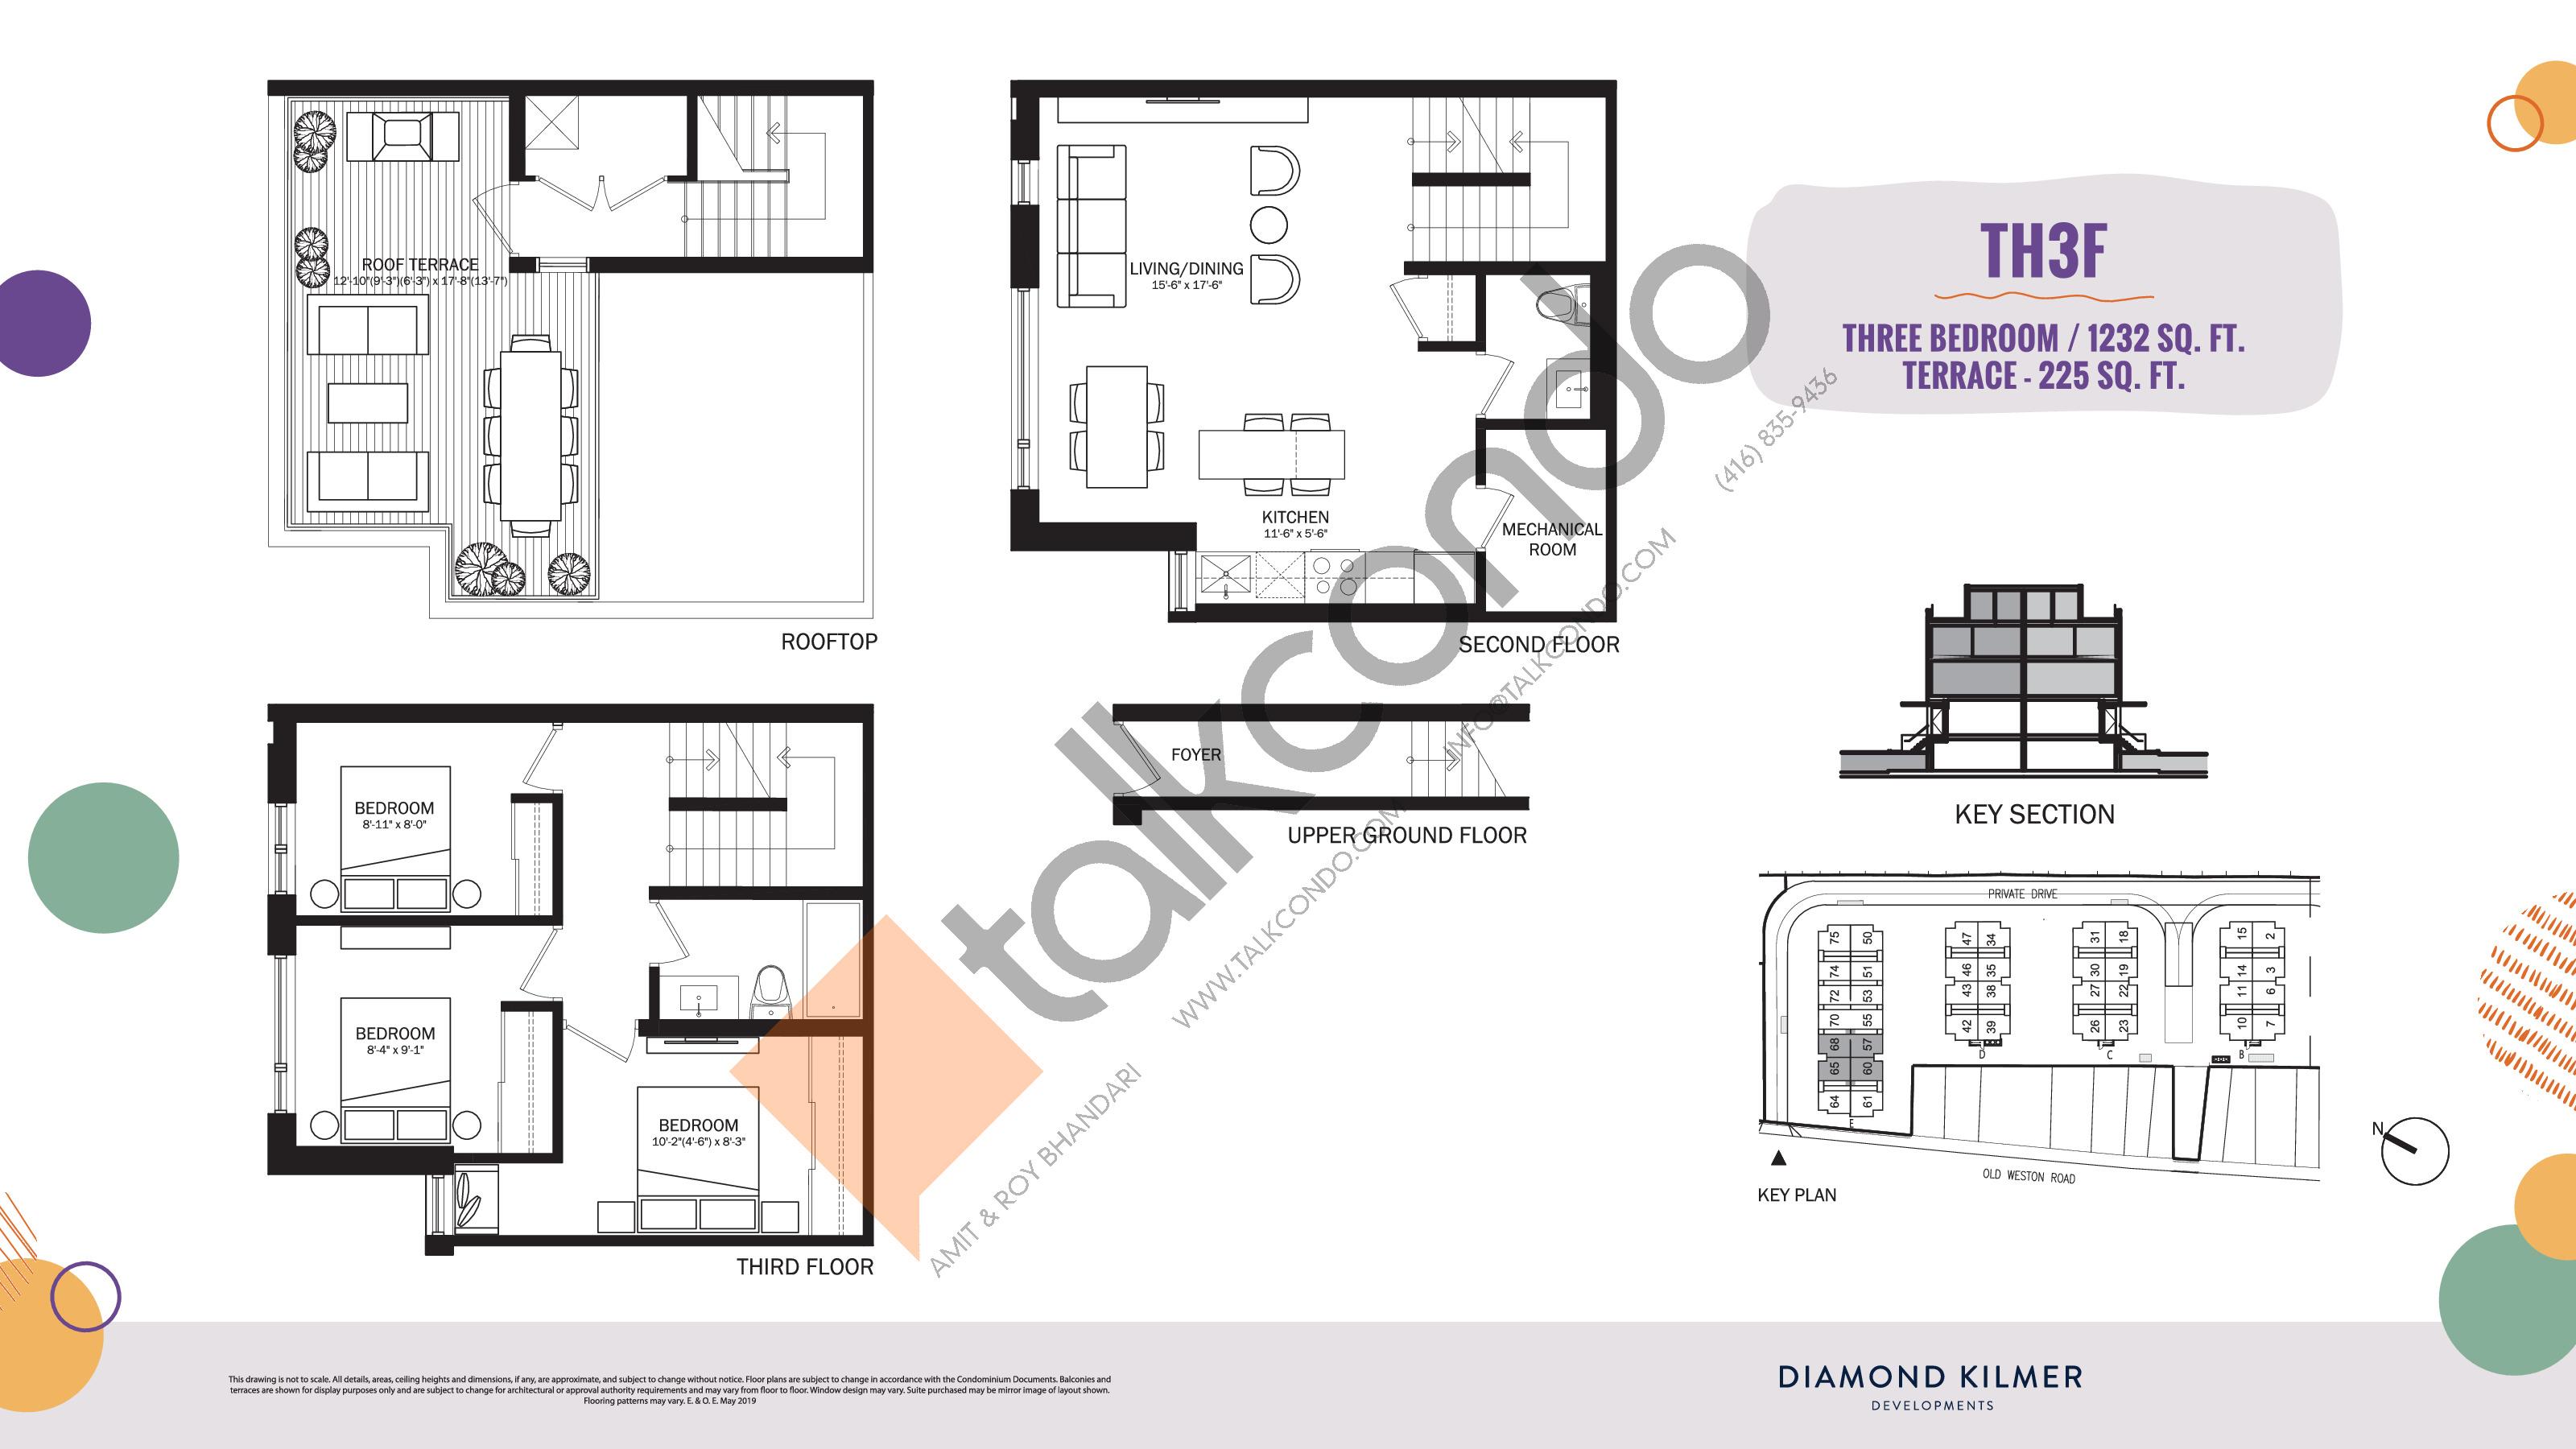 TH3F Floor Plan at Reunion Crossing Condos & Urban Towns - 1232 sq.ft